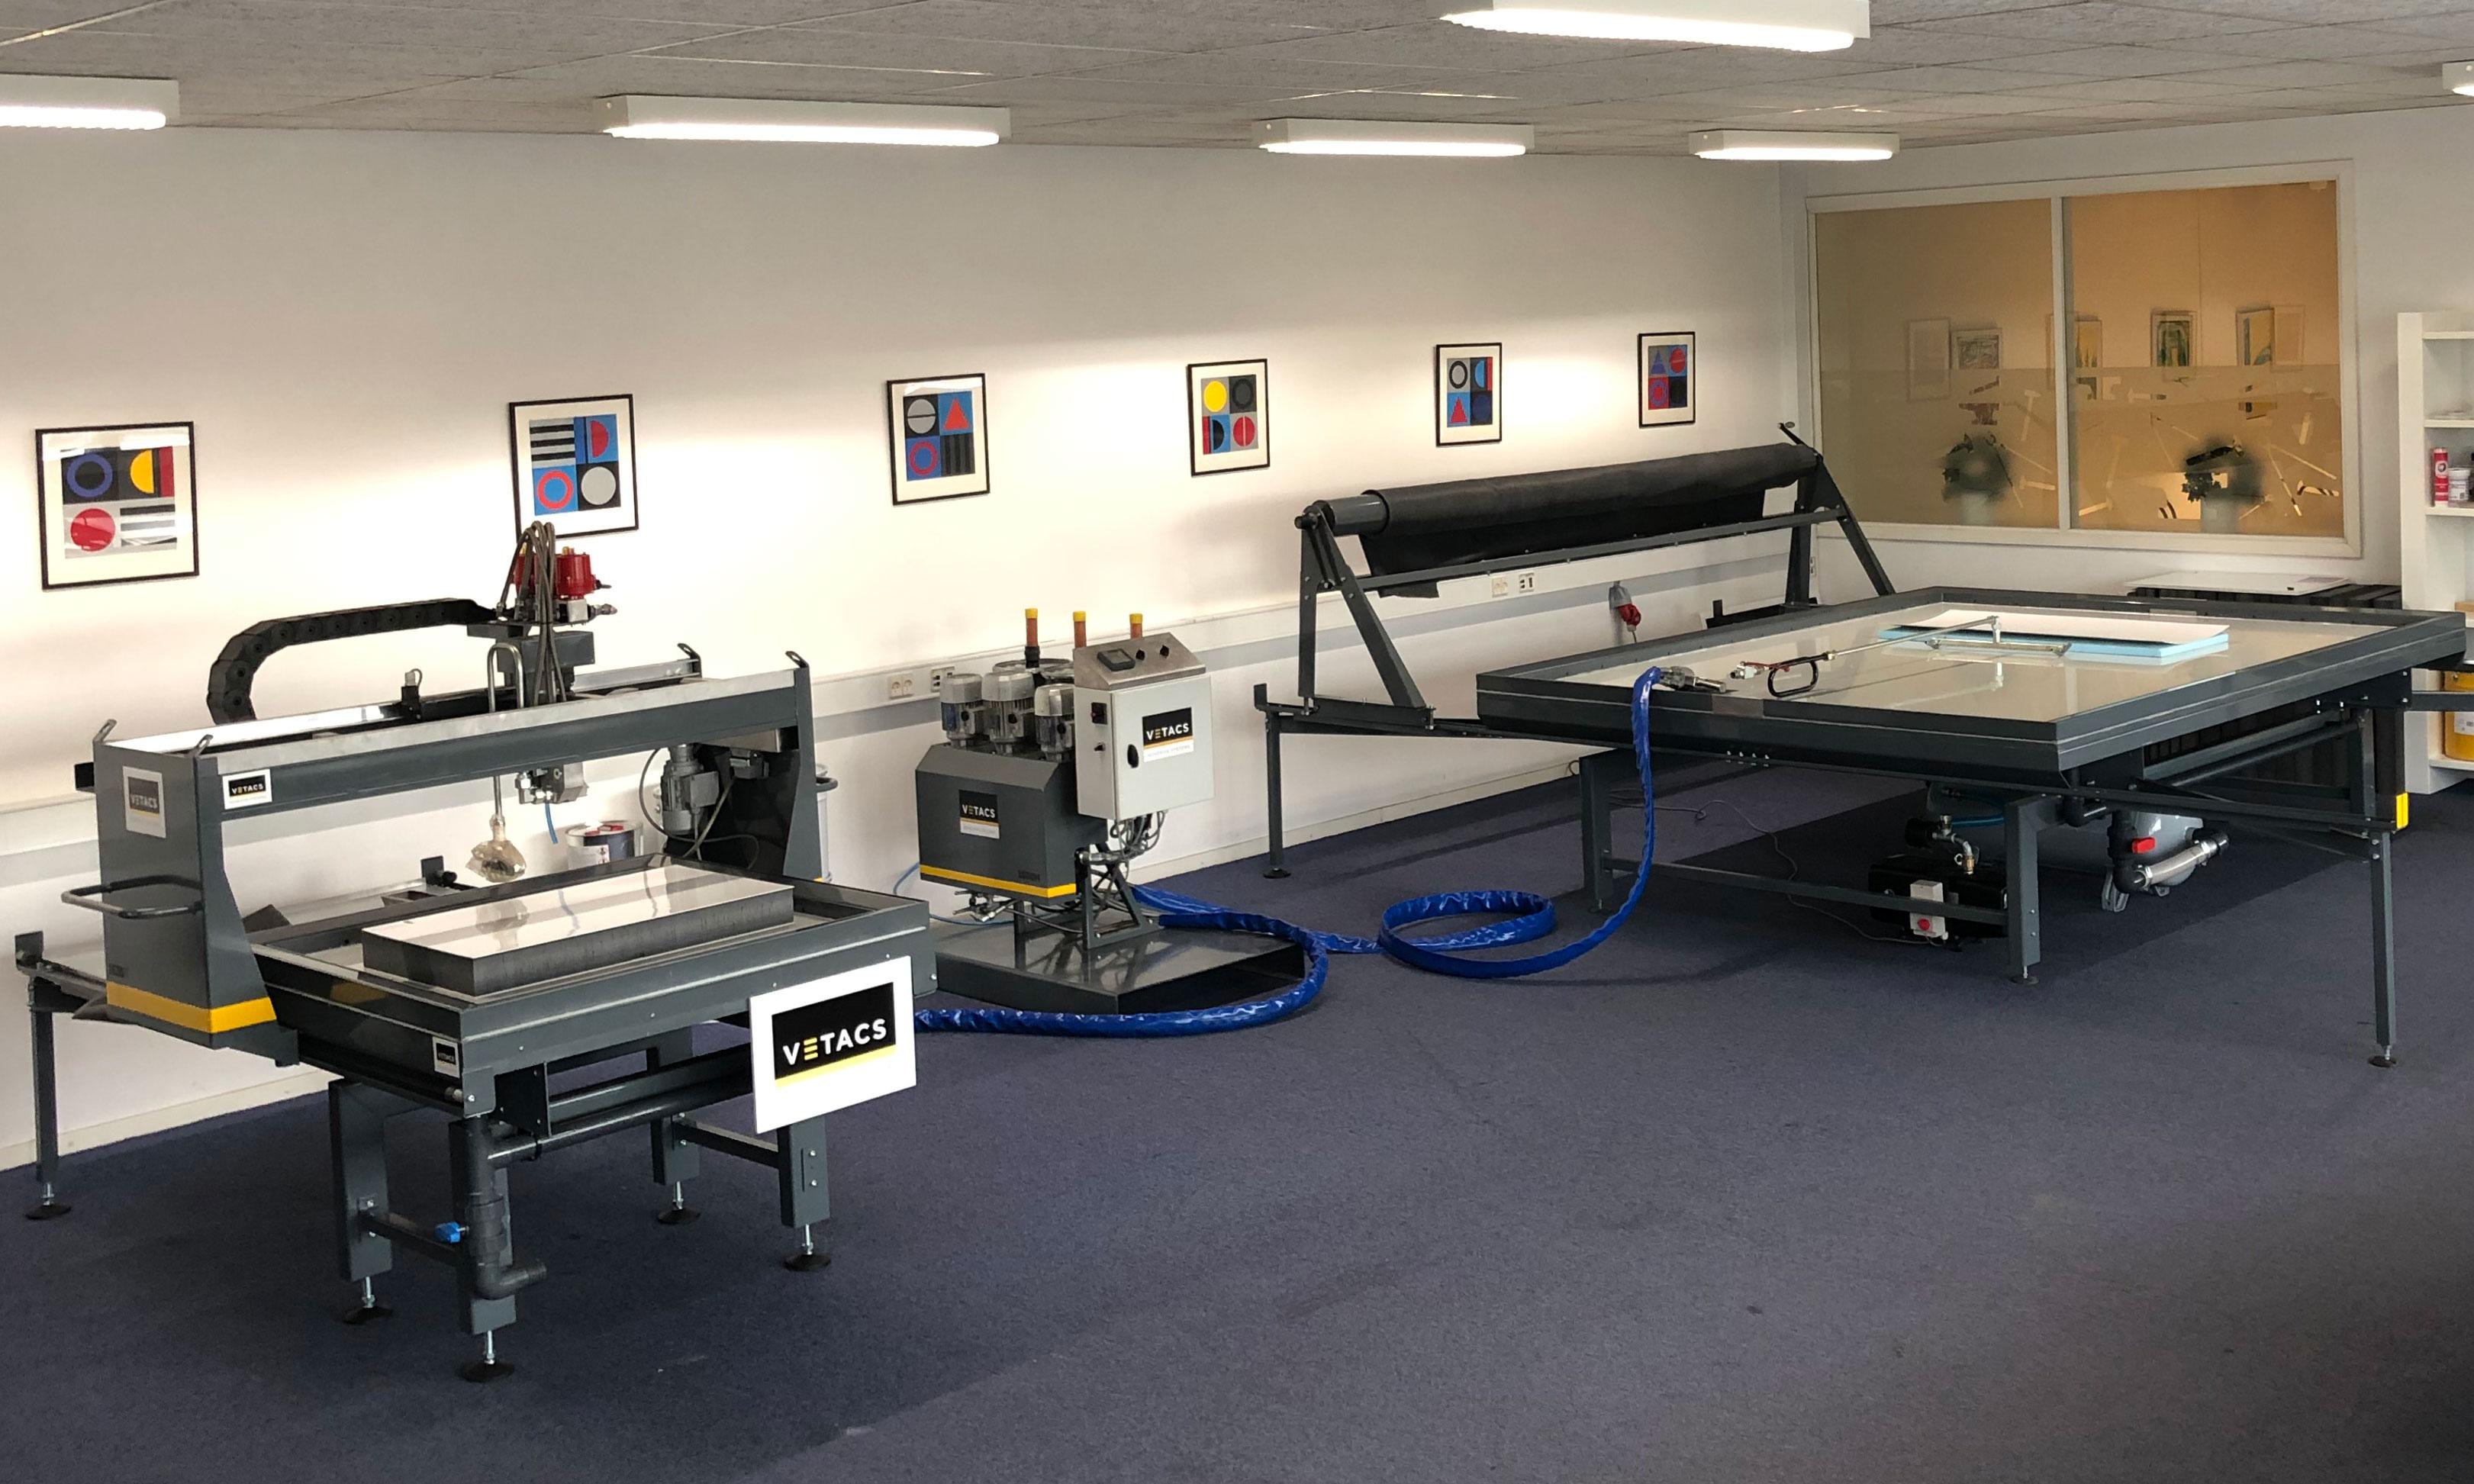 Vetacs Showroom - Vacuum Press - Hydraulic Press - Sandwich Panel Production - Vetacs